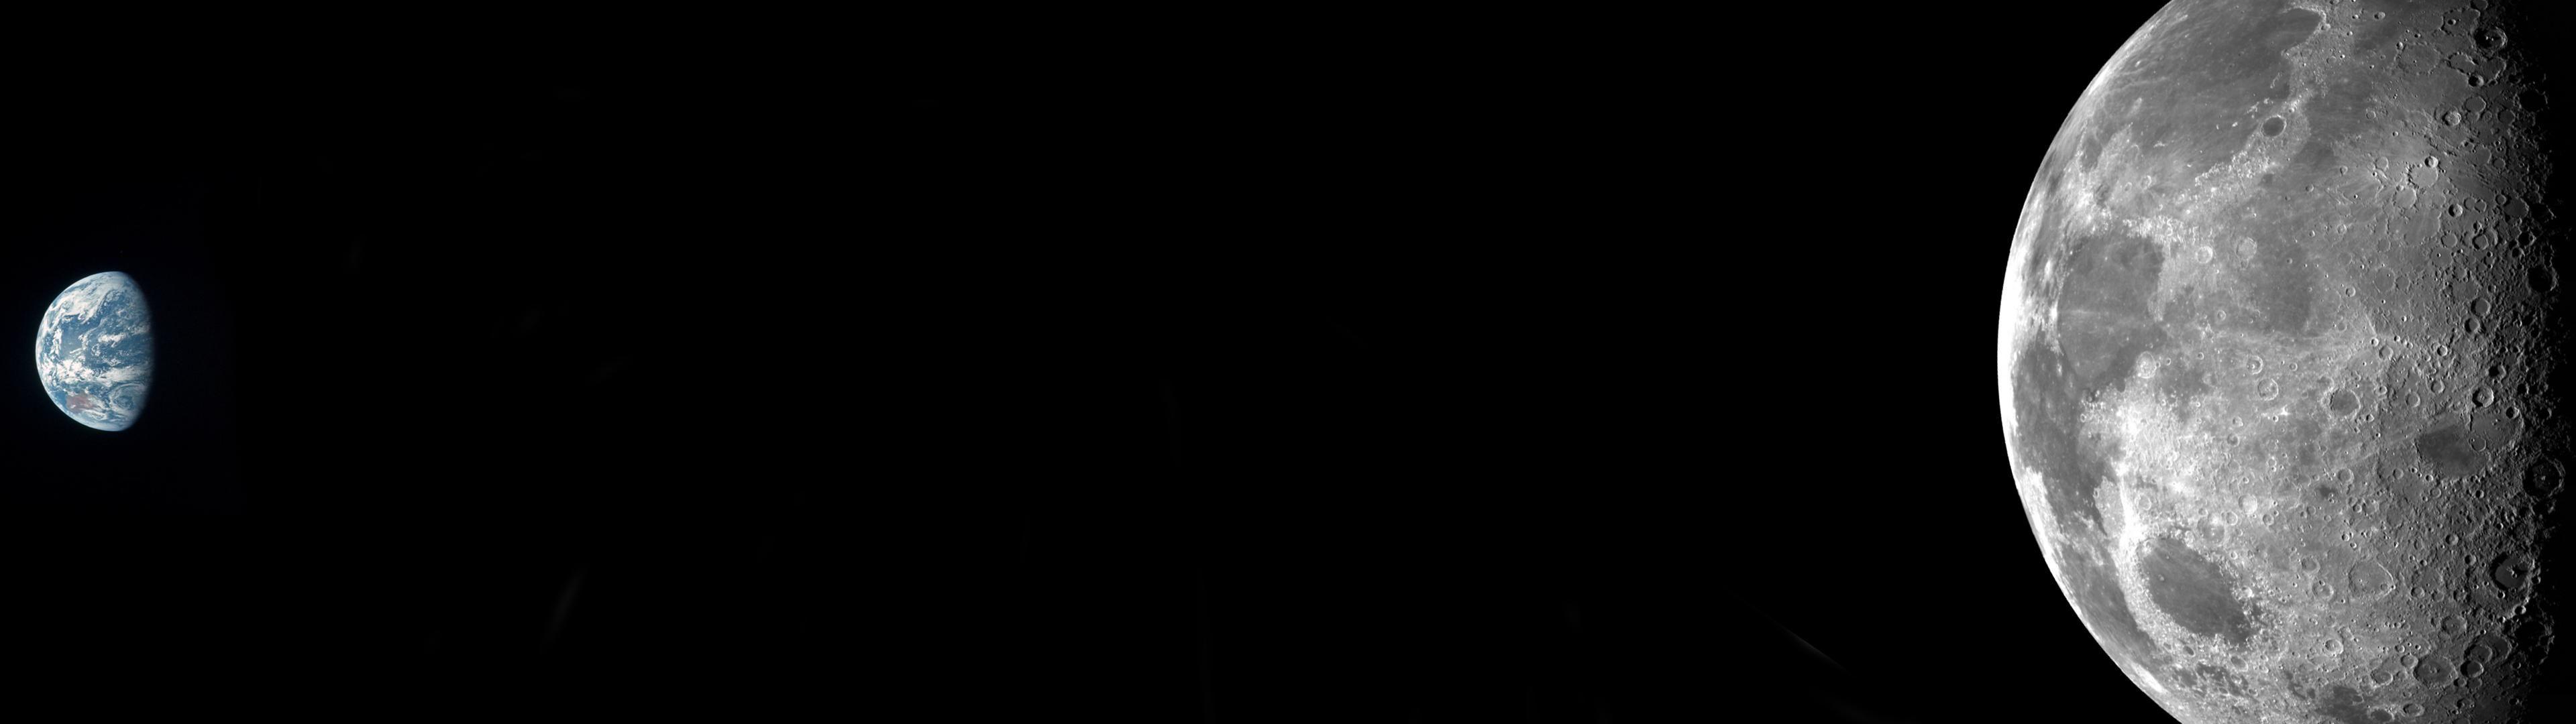 The eath from moon orbit (3840x1080) dual screen